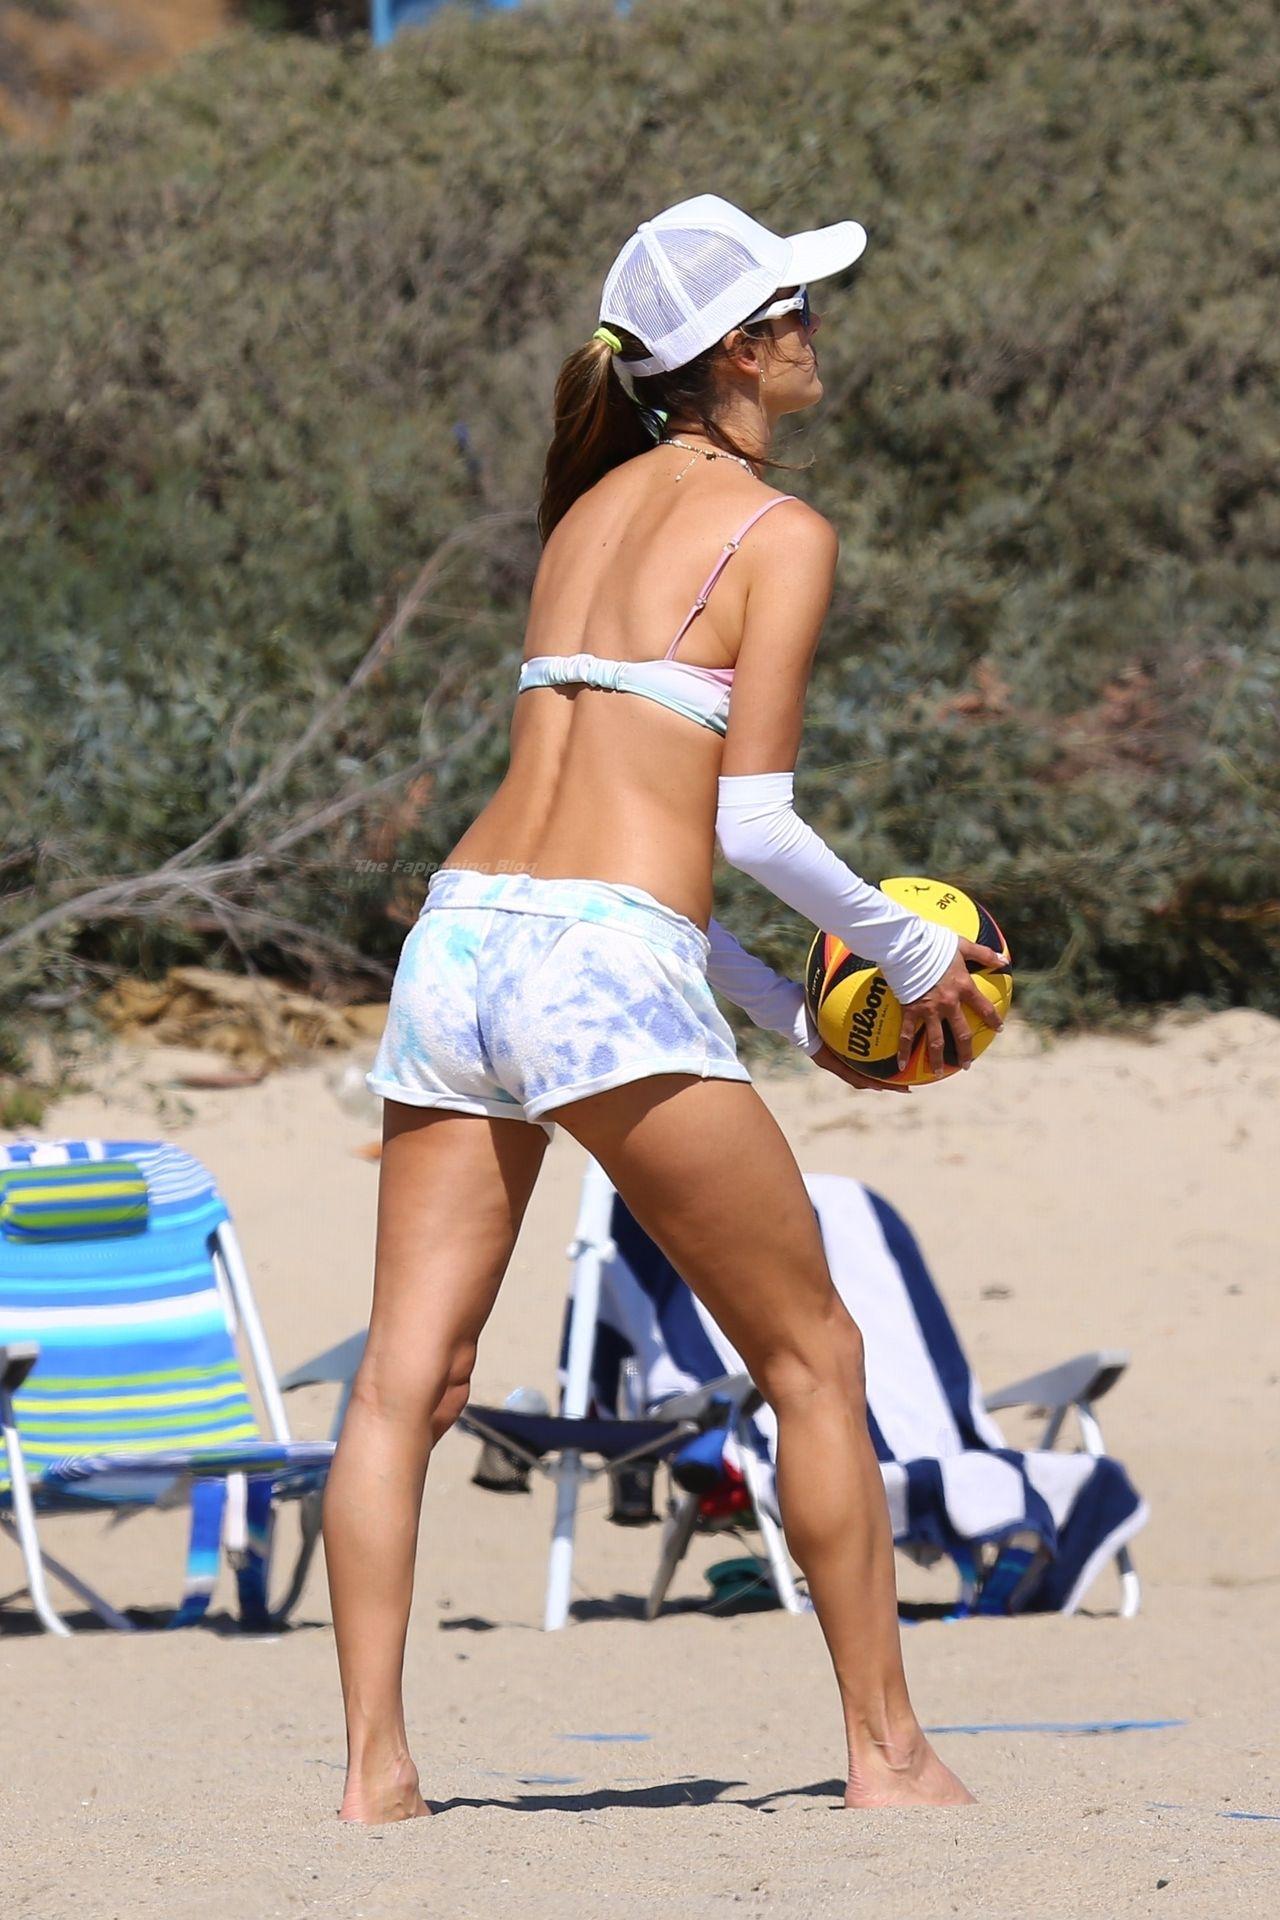 Alessandra-Ambrosio-Sexy-The-Fappening-Blog-22-1.jpg